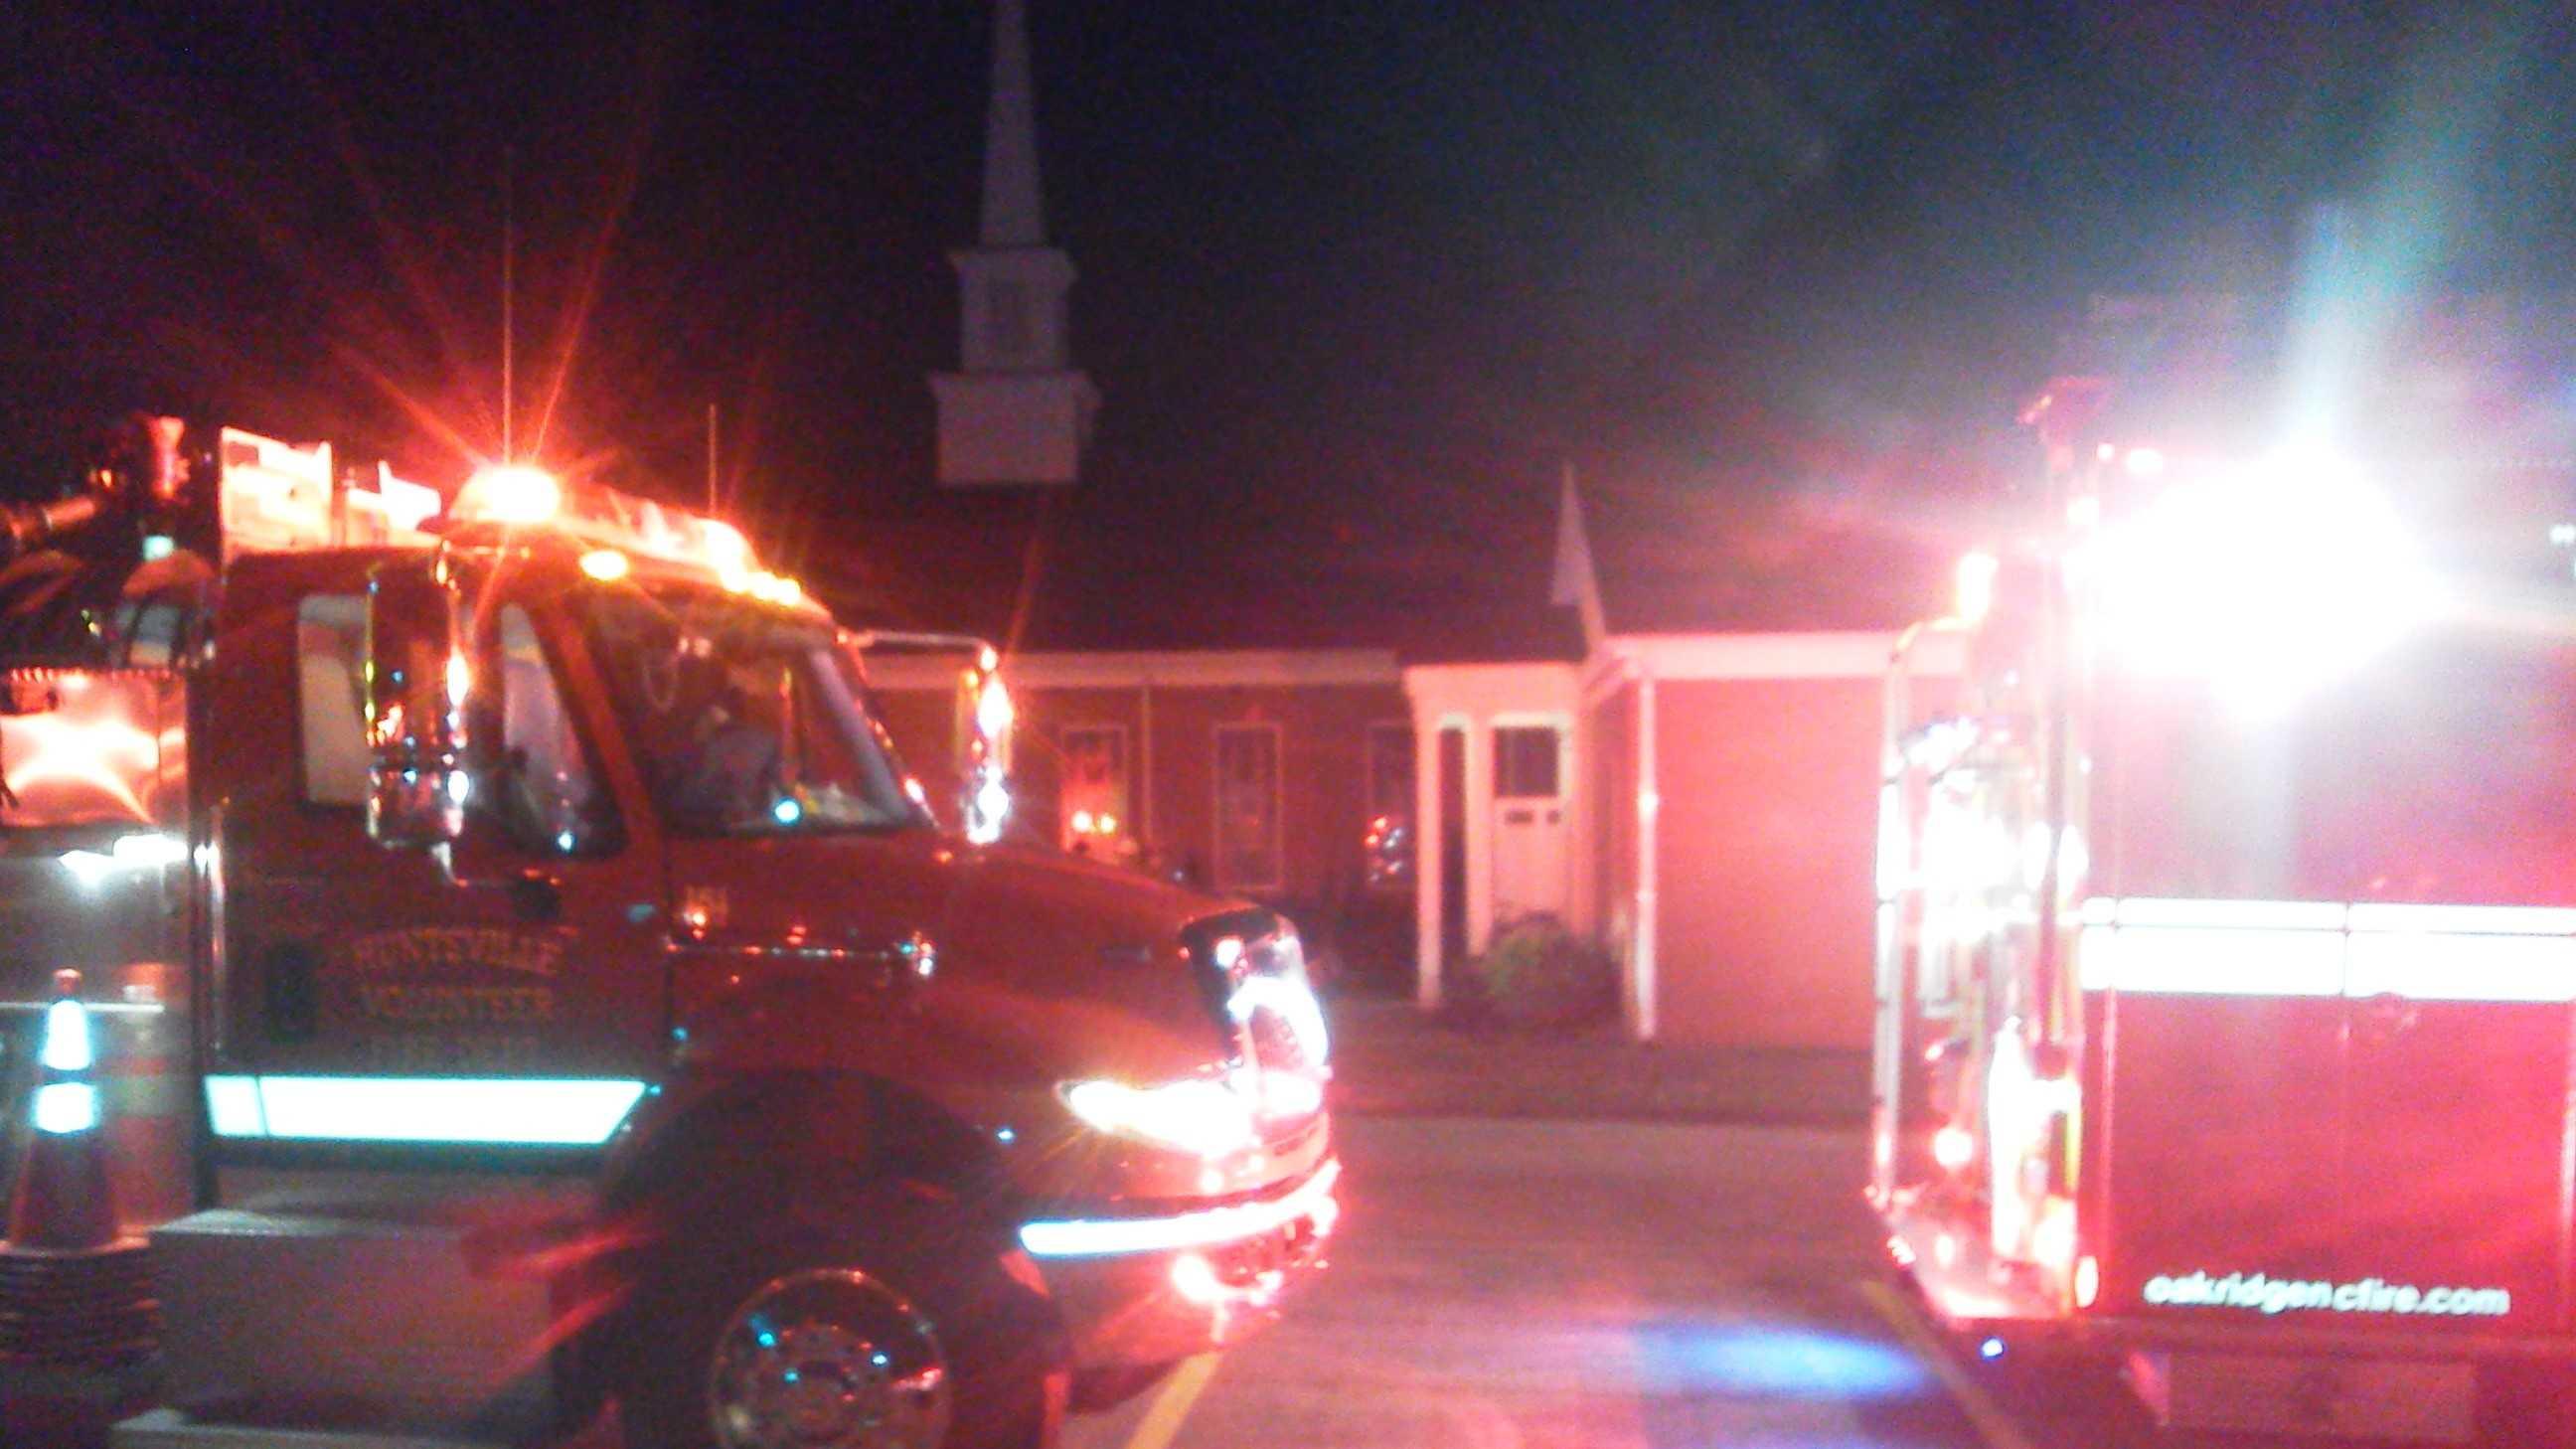 Mt. Zion United Methodist Church fire